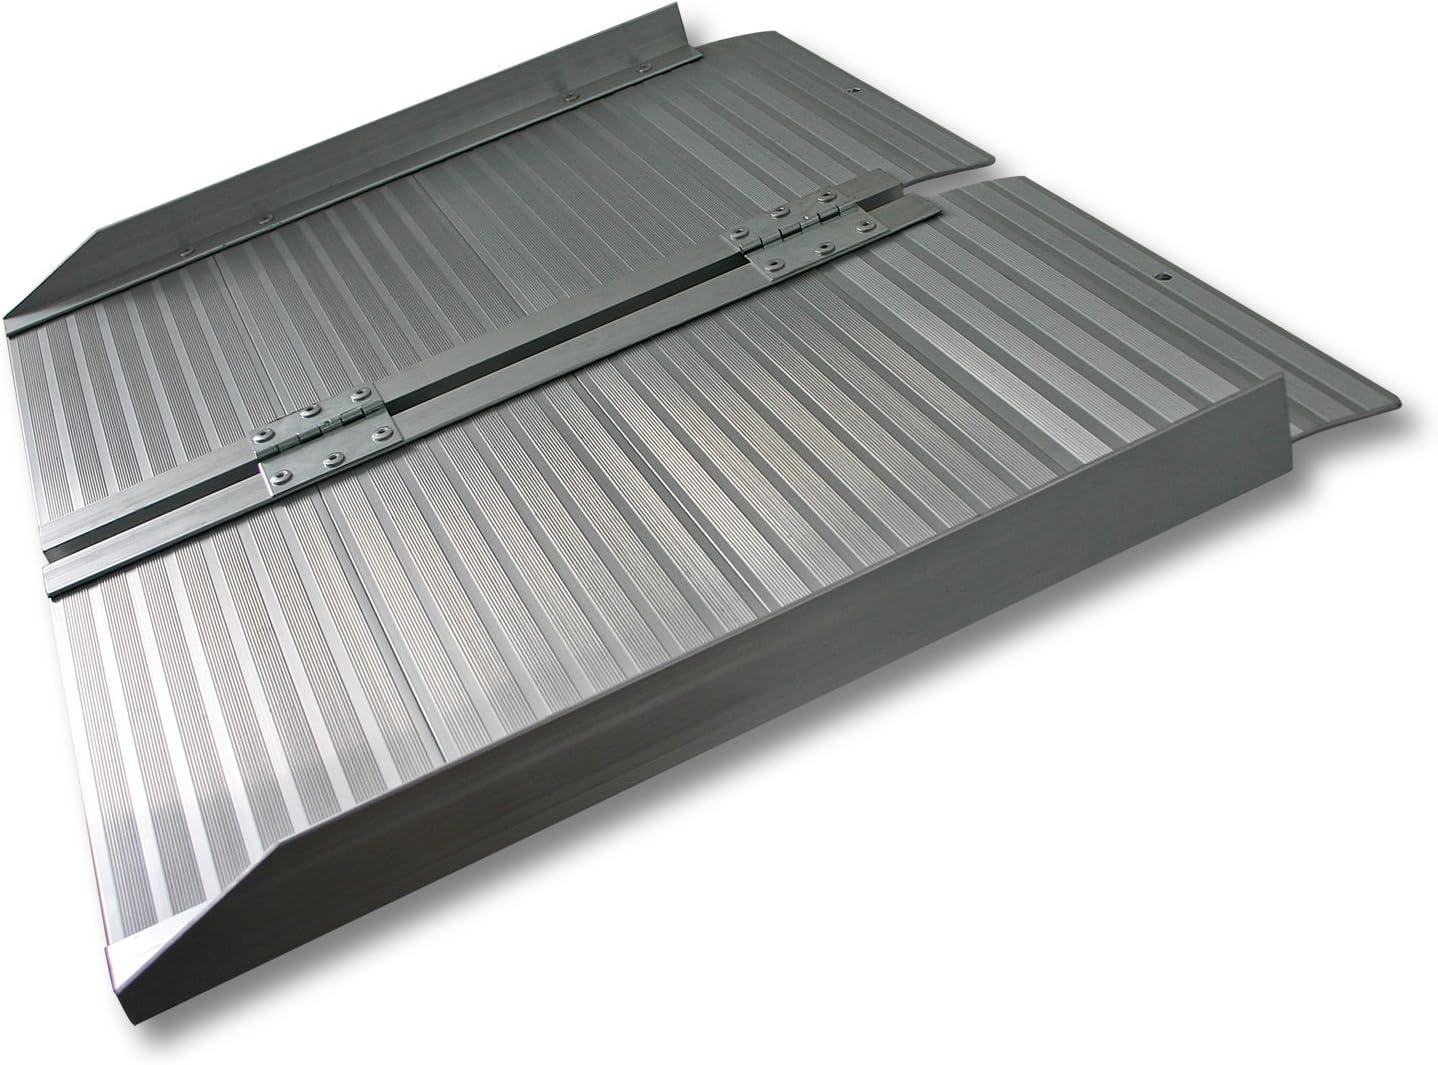 WilTec Rampa Silla Ruedas Plegable 122cm 270kg Aluminio portátil Plana Minusválidos Acceso Sin barreras